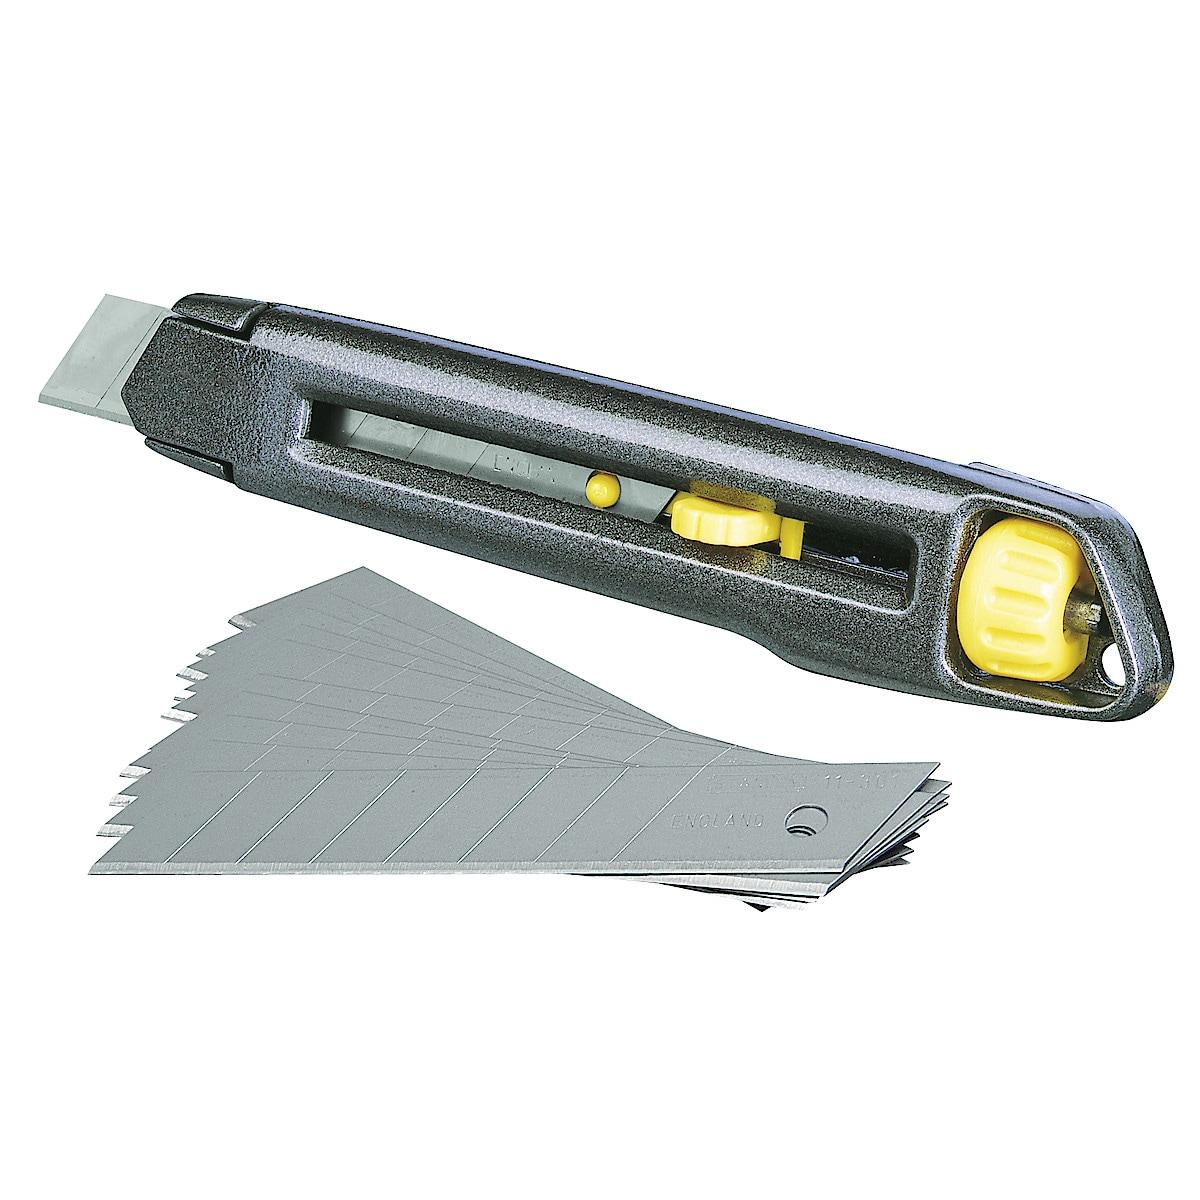 Brytbladskniv Stanley Interlock